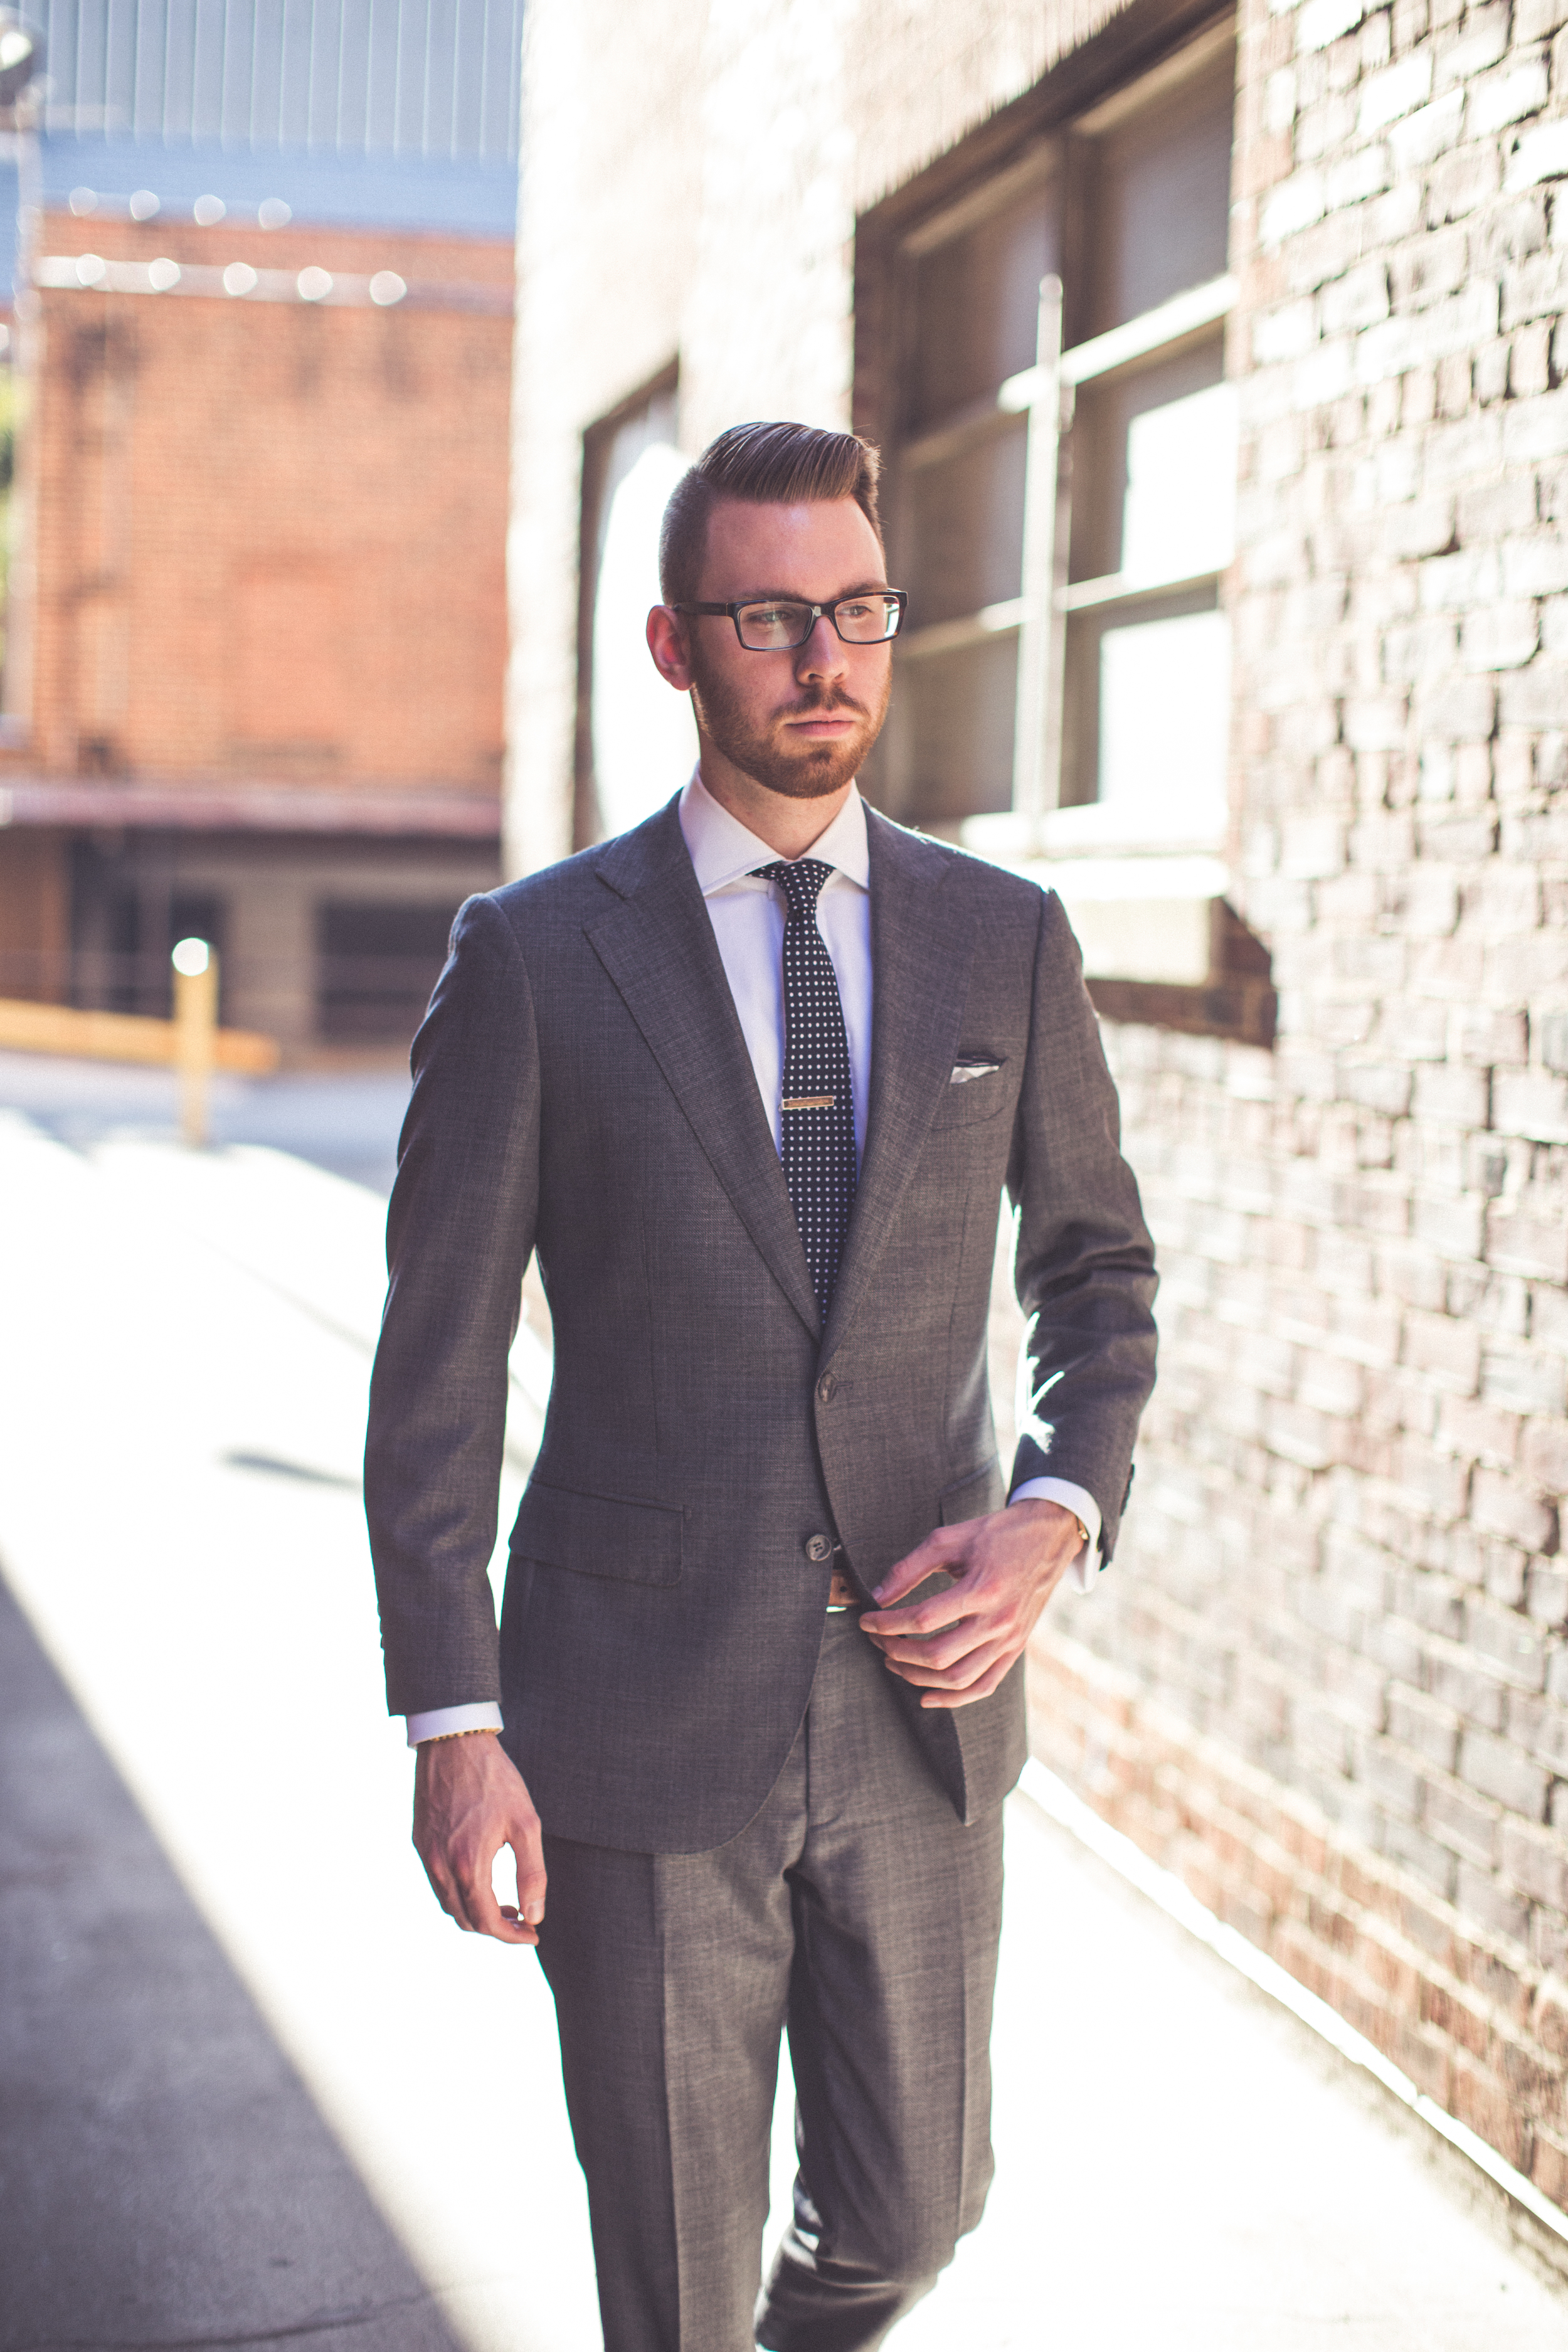 Suit: Suit Supply, Shirt: Ledbury, Tie/Pocket square: Sprezza Box, Tie-bar: The Tie Bar, Glasses: Burberry.